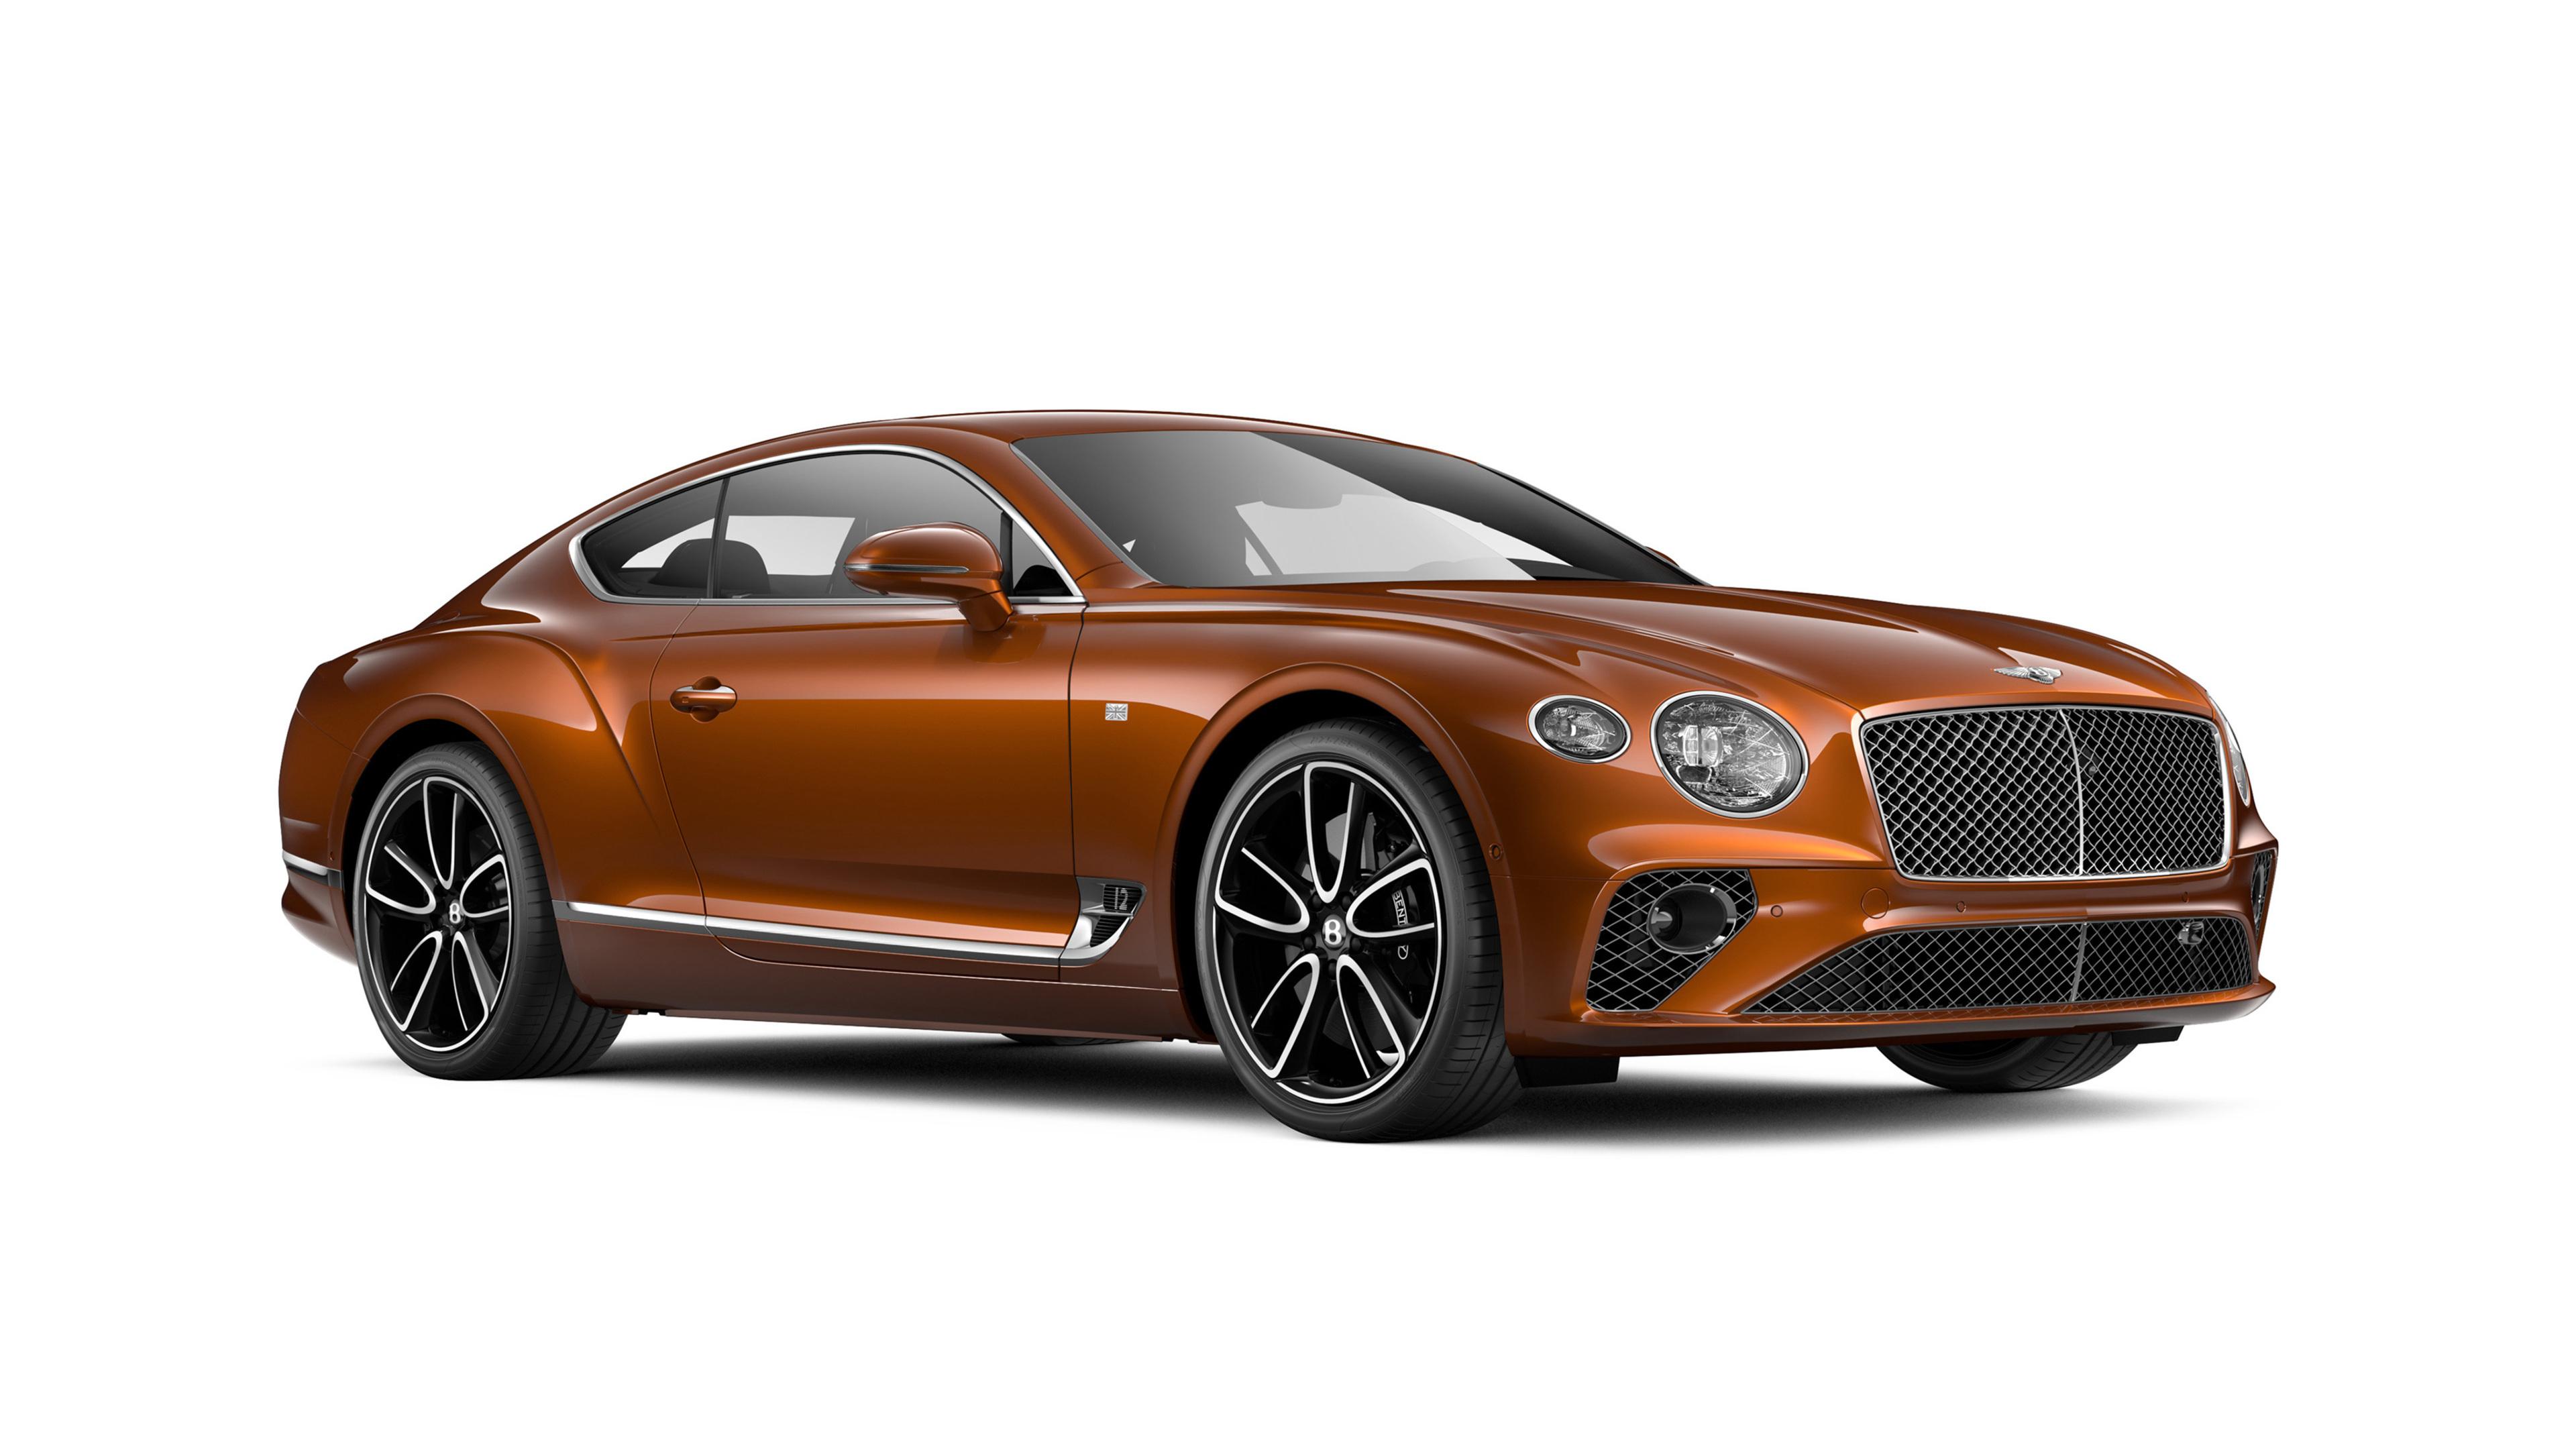 2018 bentley continental gt 1539108188 - 2018 Bentley Continental Gt - hd-wallpapers, cars wallpapers, bentley wallpapers, bentley continental wallpapers, 4k-wallpapers, 2018 cars wallpapers